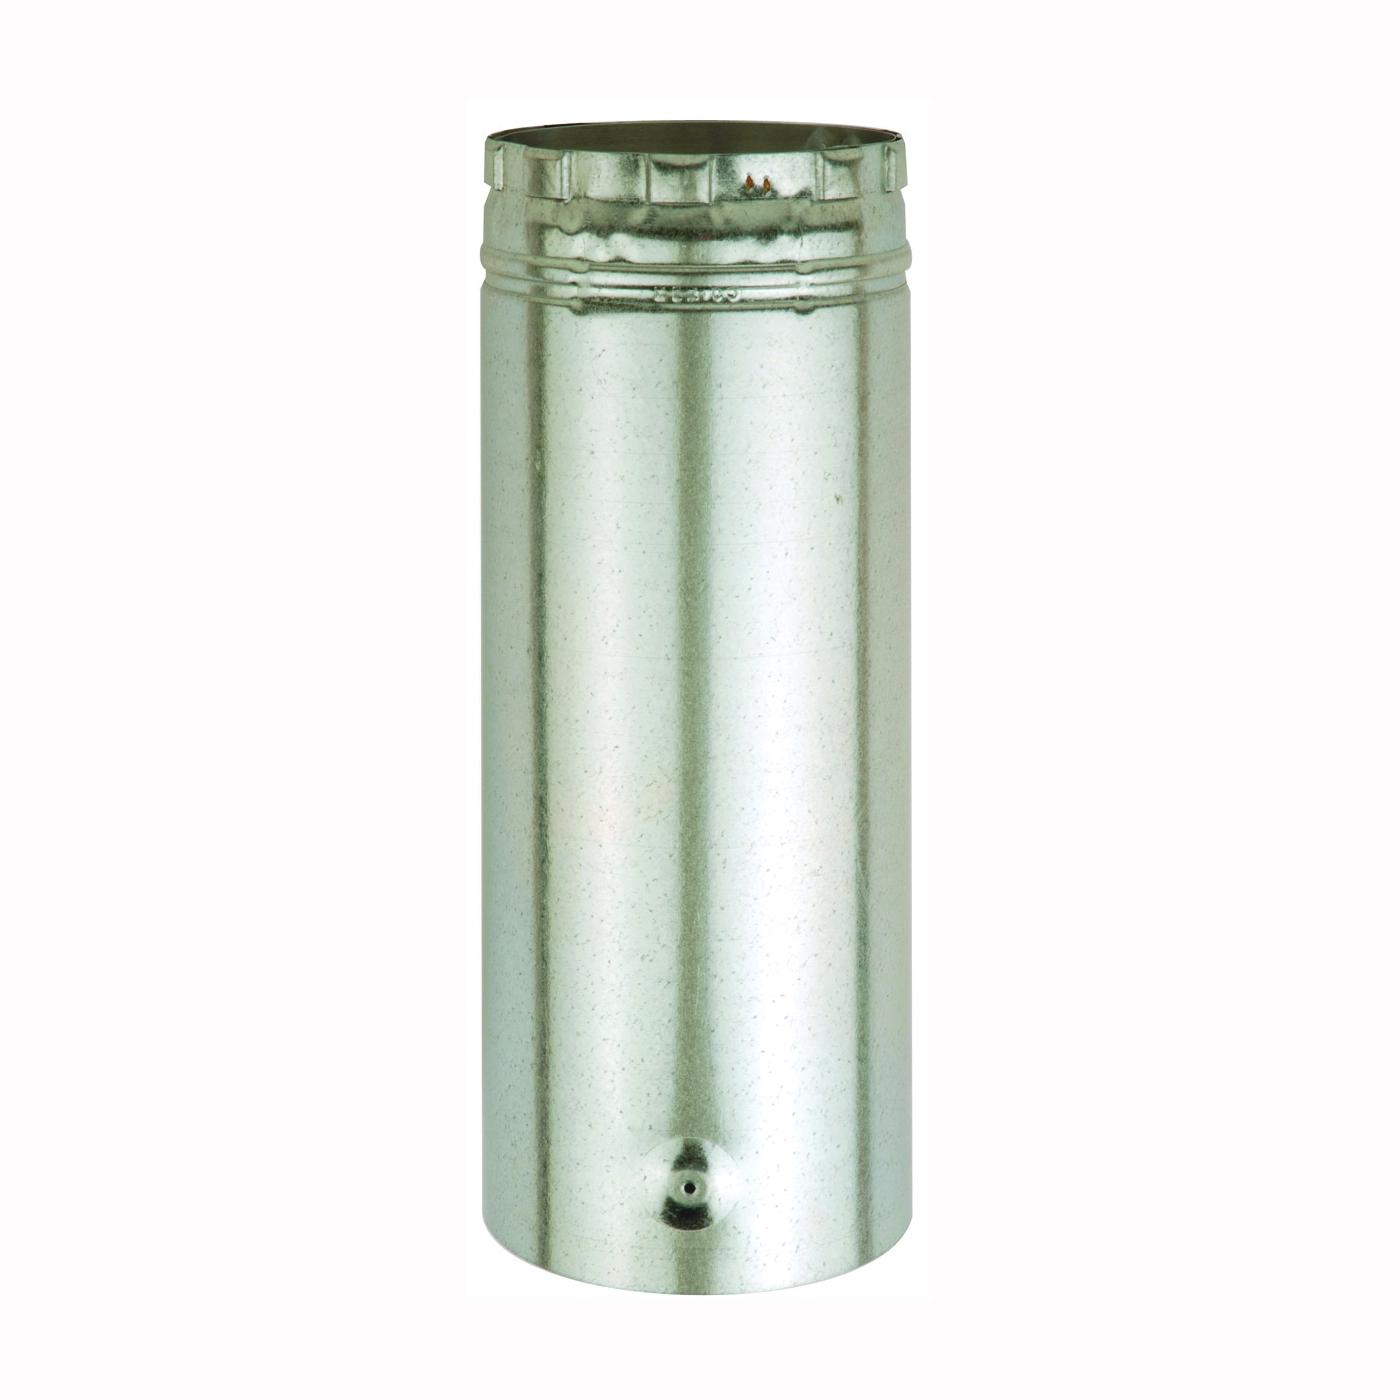 Picture of AmeriVent 5E12A Type B Gas Vent Pipe, 5 in OD, 12 in L, Galvanized Steel